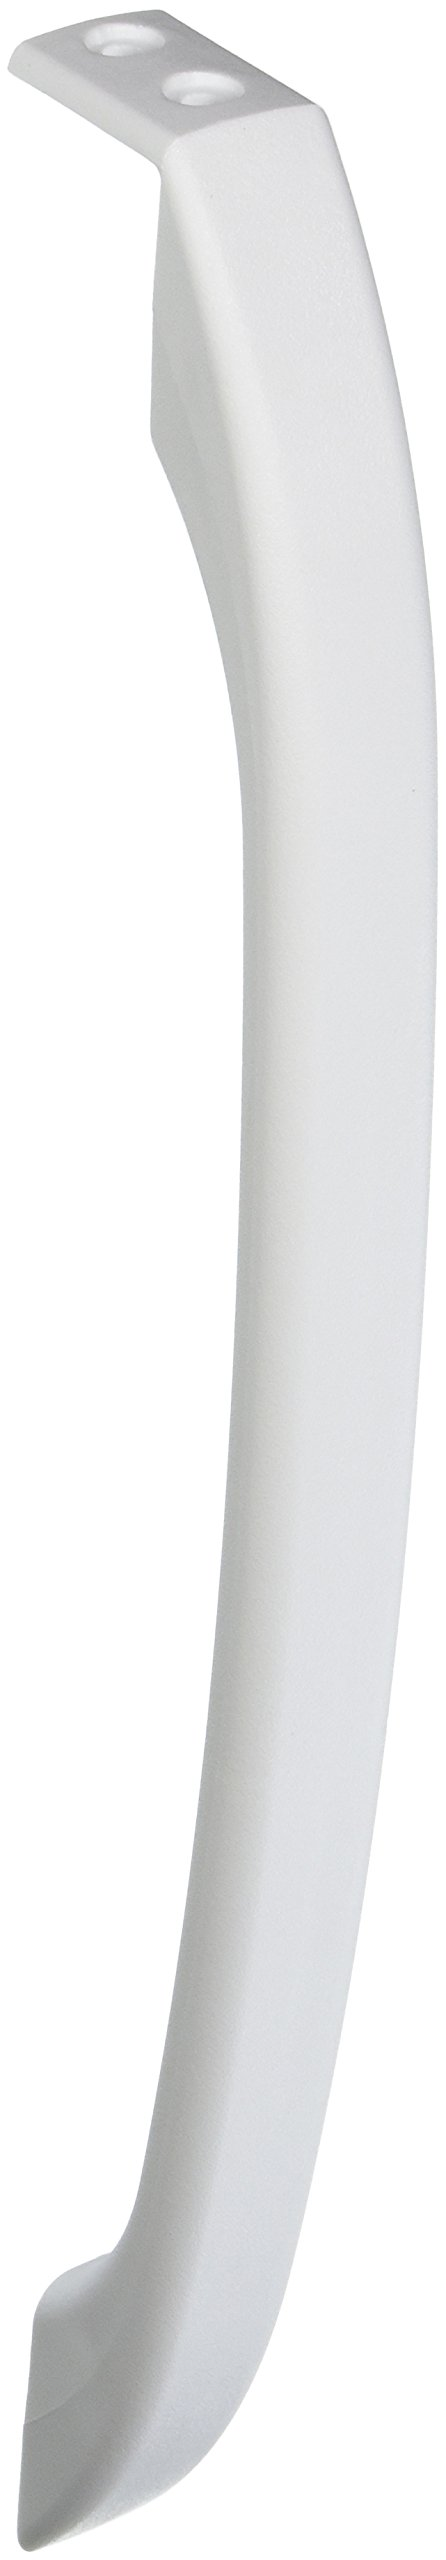 Frigidaire 218428101 Door Handle for Refrigerator, White